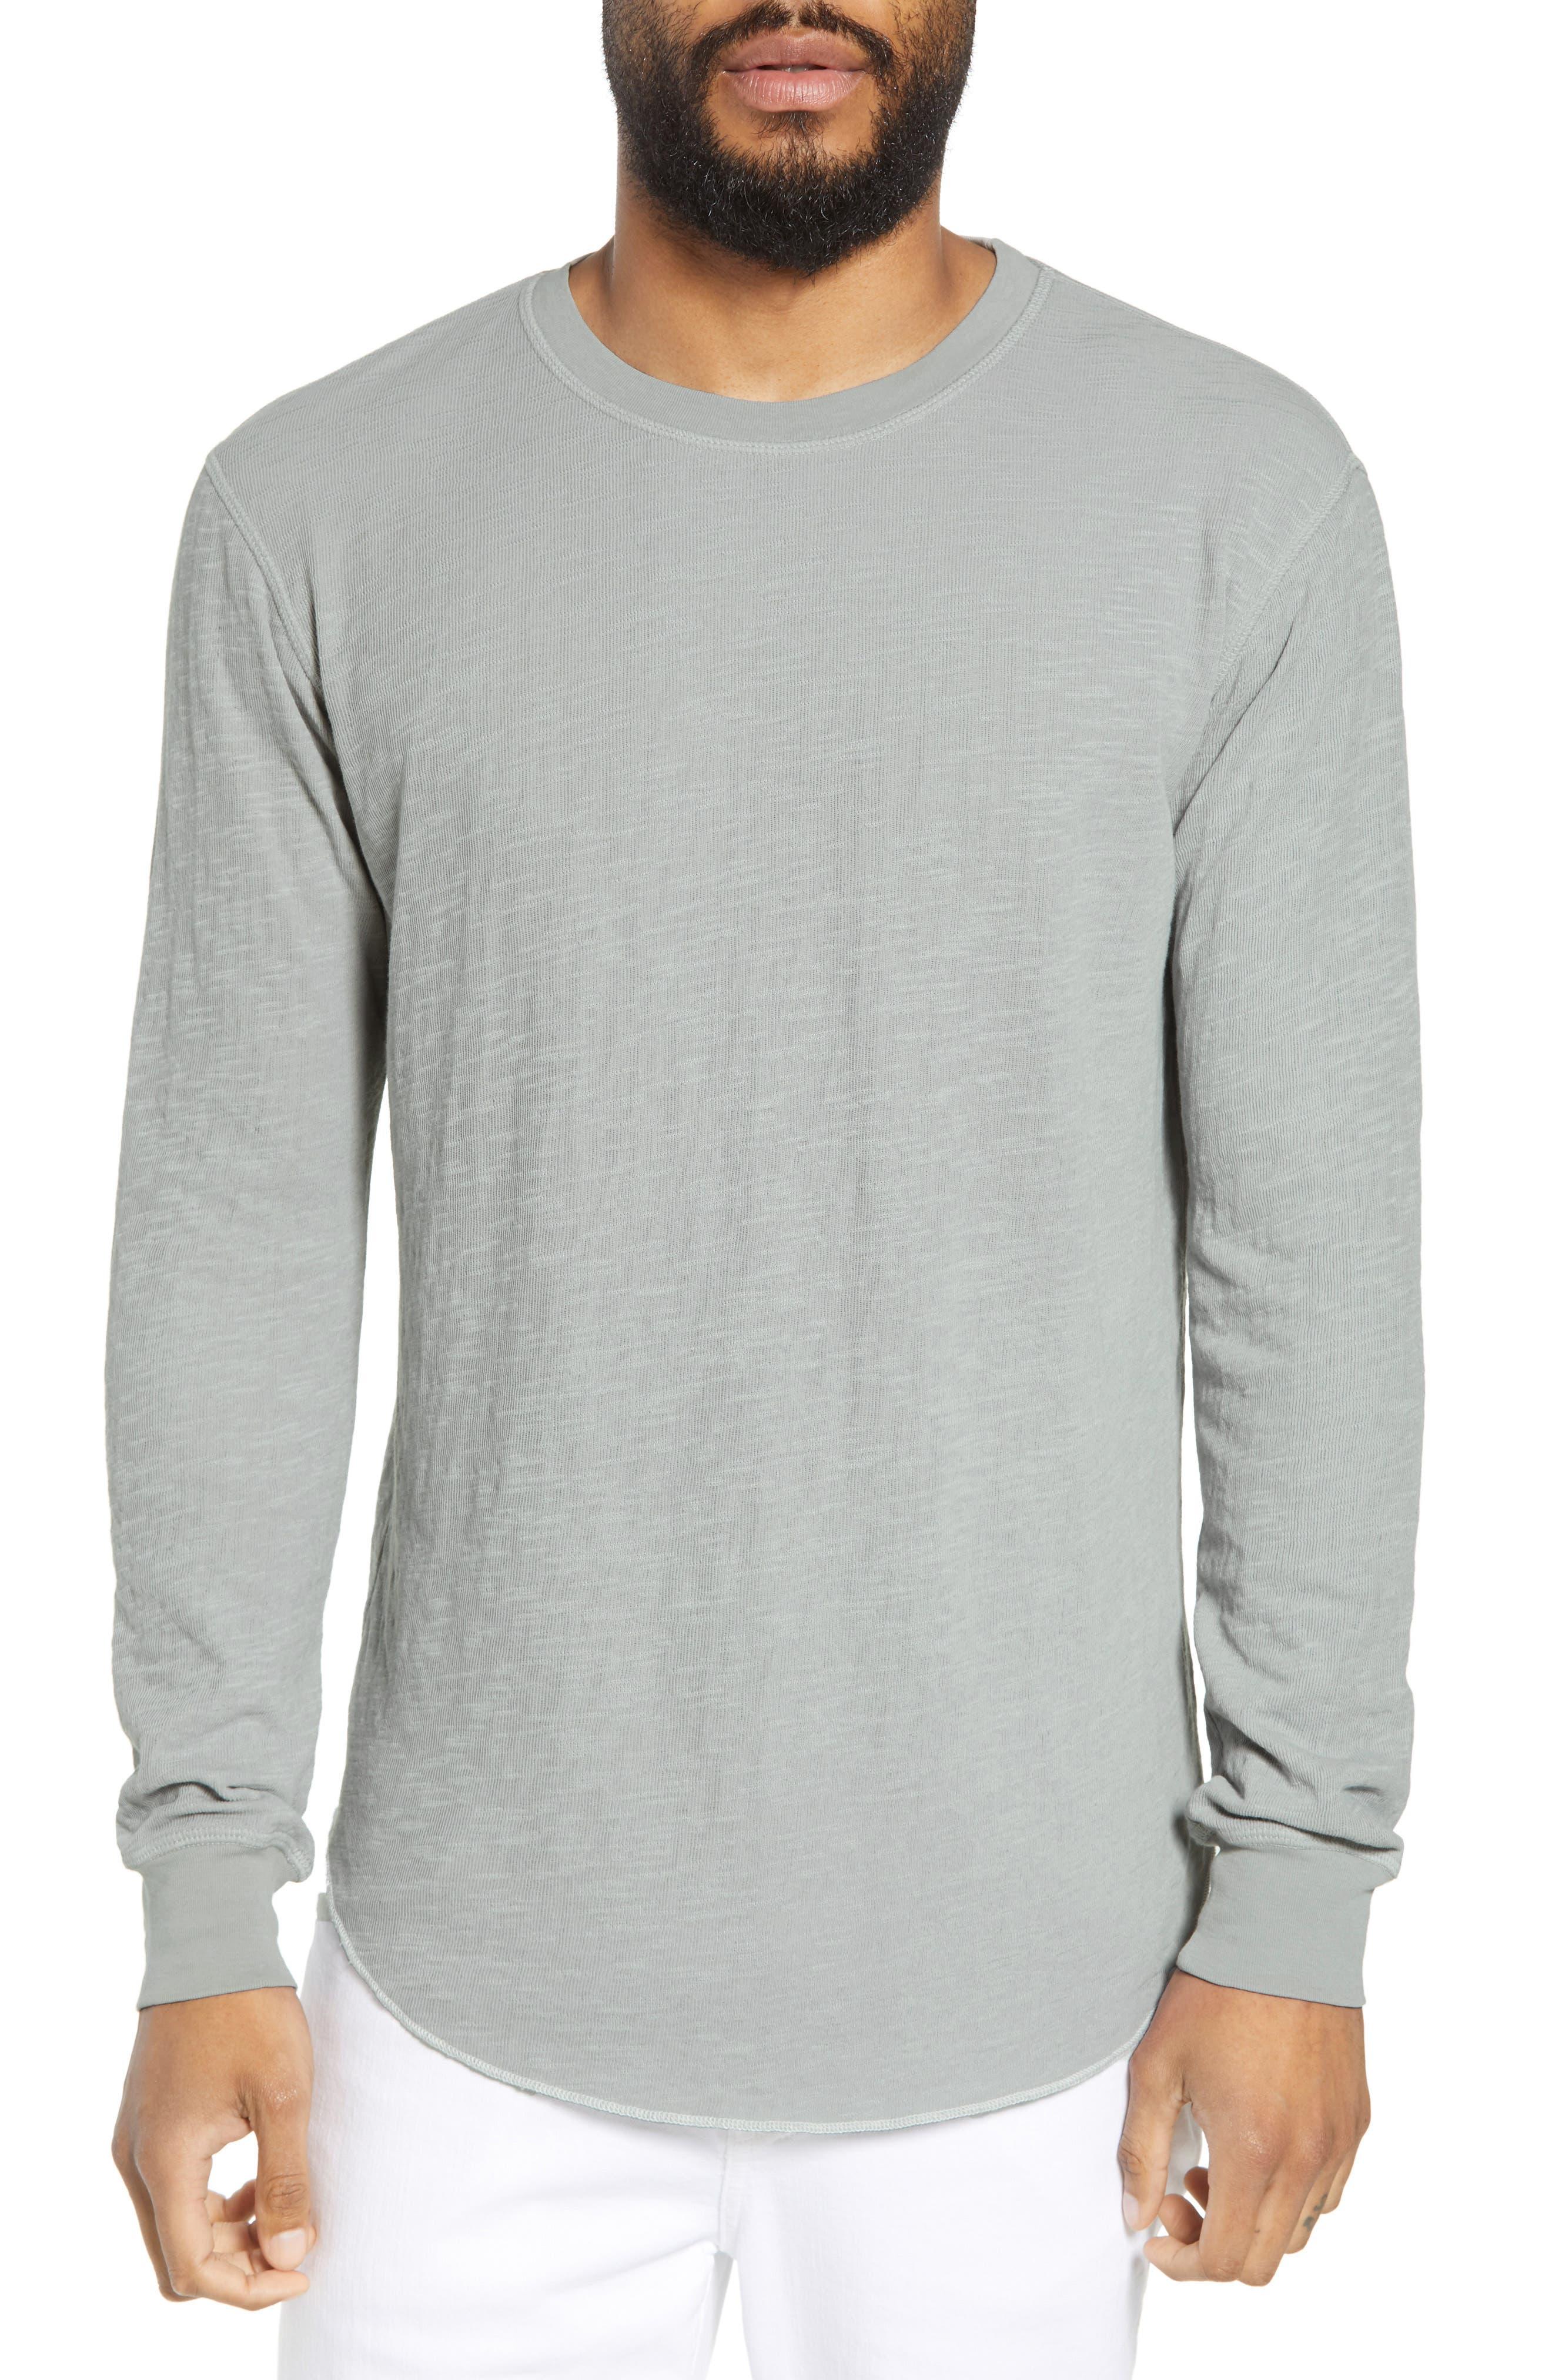 GOODLIFE, Double Layer Slim Crewneck T-Shirt, Main thumbnail 1, color, QUARRY